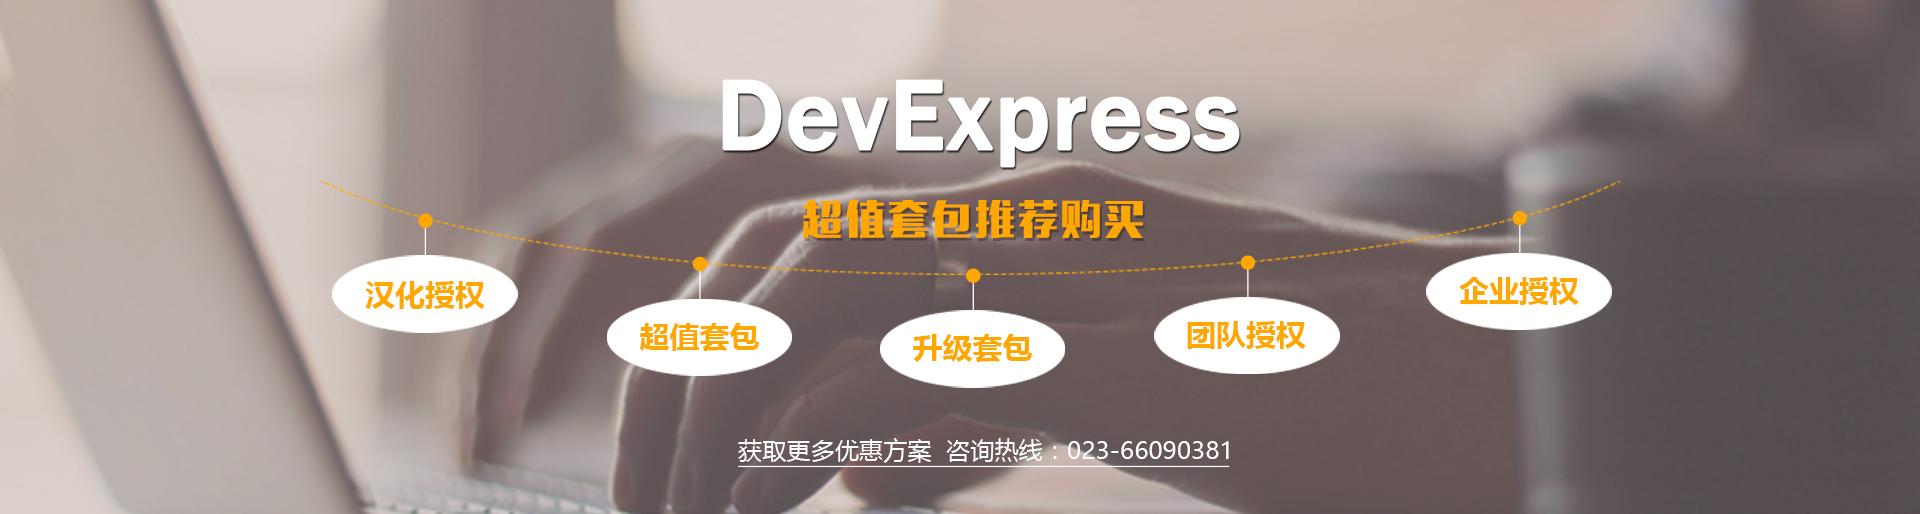 DevExpress企业集团授权